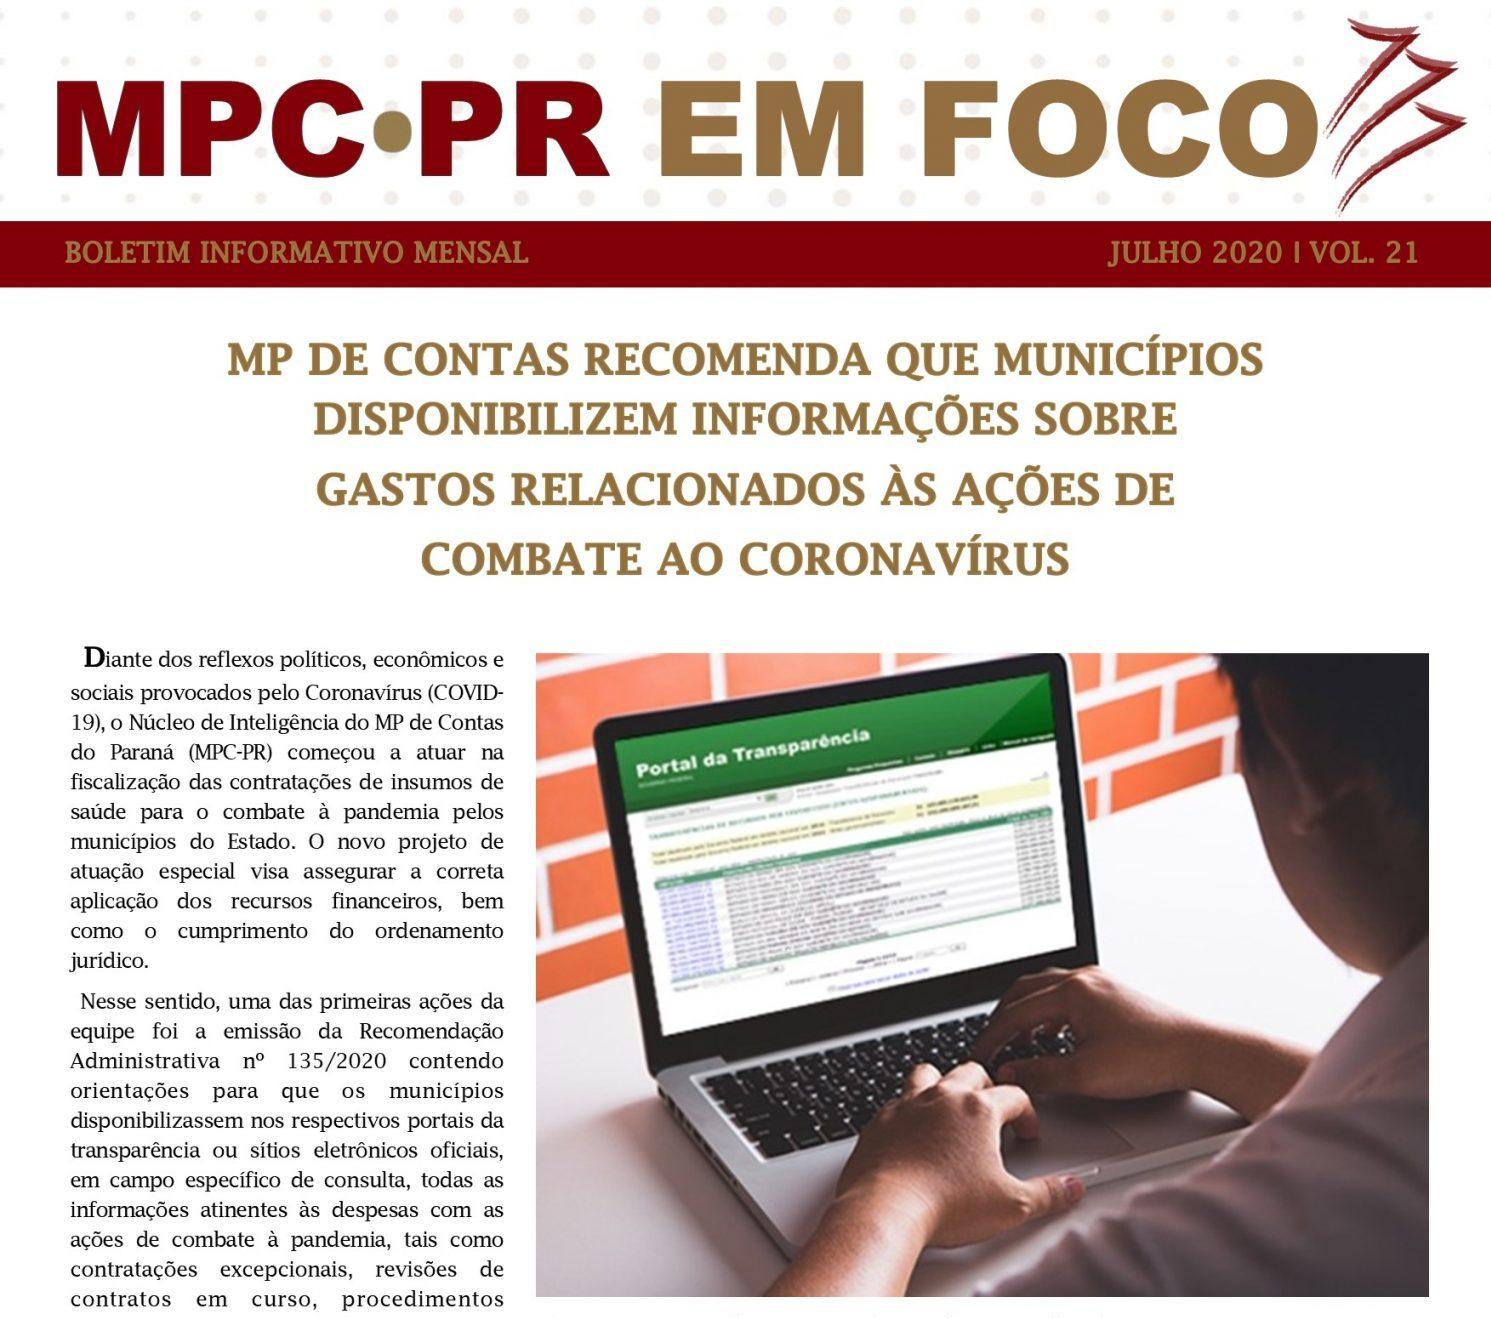 Boletim Informativo MPC-PR em Foco julho/2020